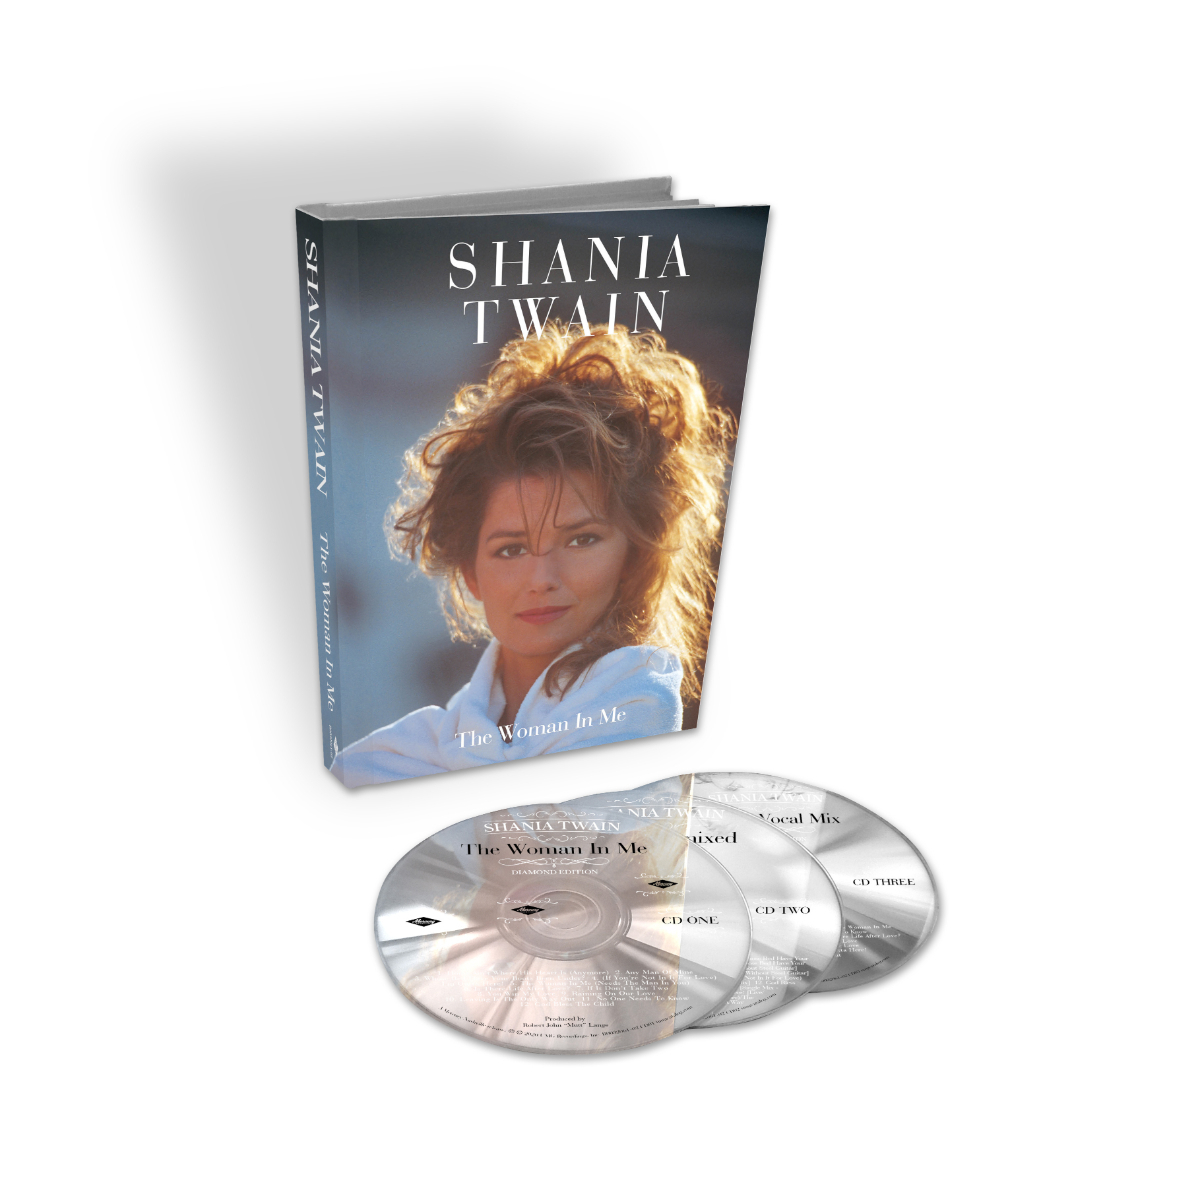 The Woman In Me: Diamond Edition 3 CD Box Set